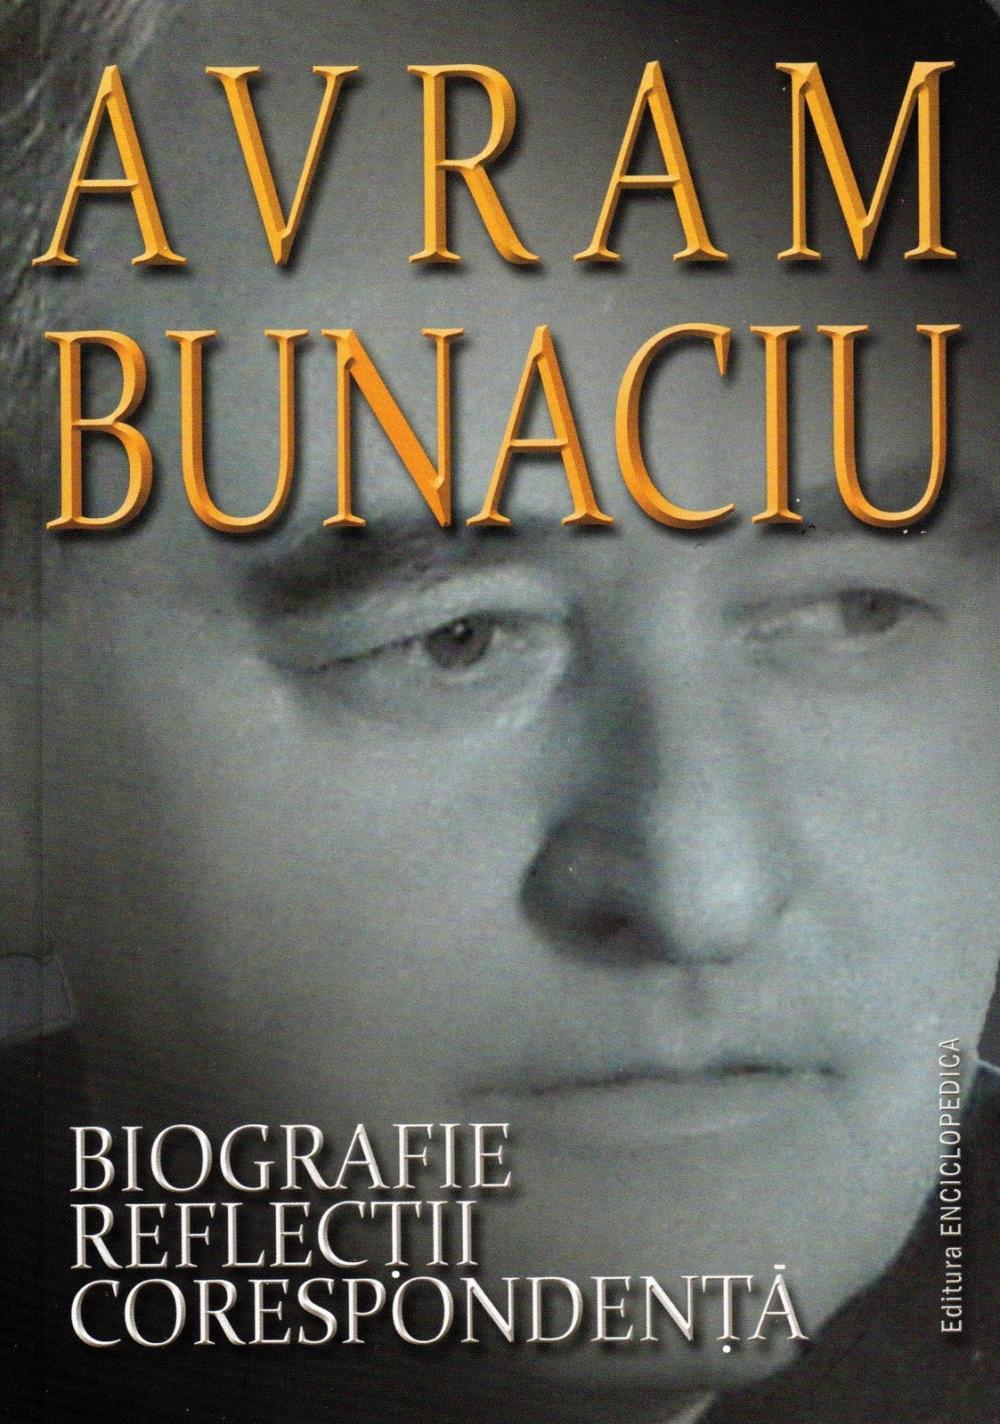 Avram Bunaciu. Biografie. Reflectii. Corespondenta